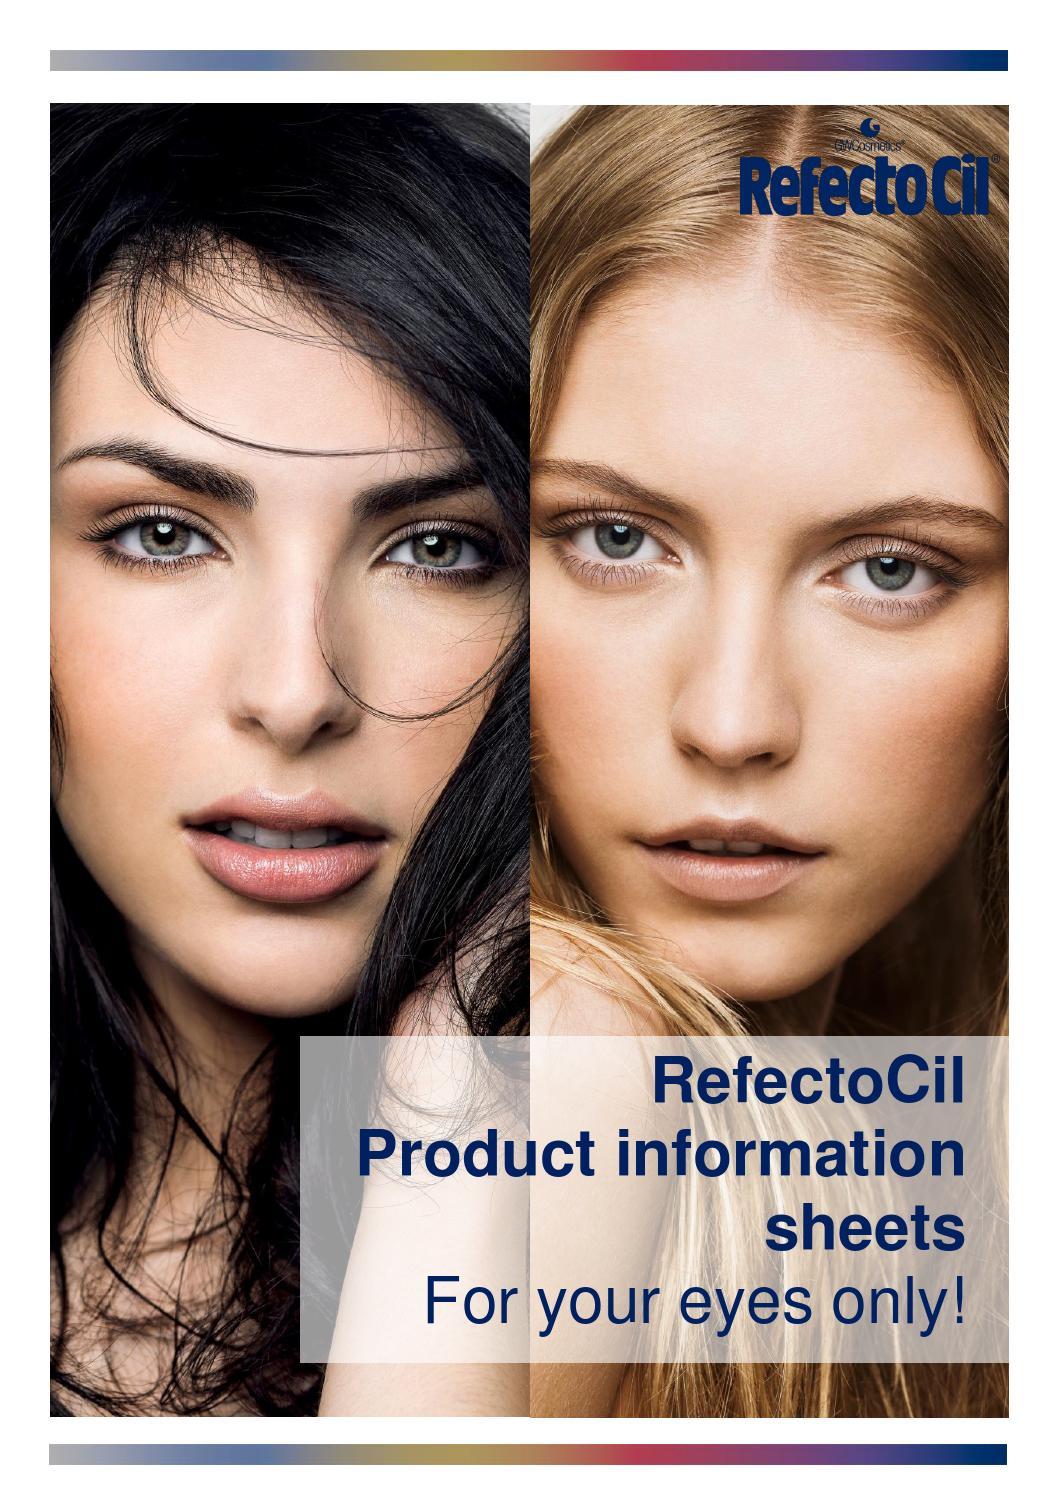 Refectocil product information sheets by marina sulzer issuu nvjuhfo Choice Image